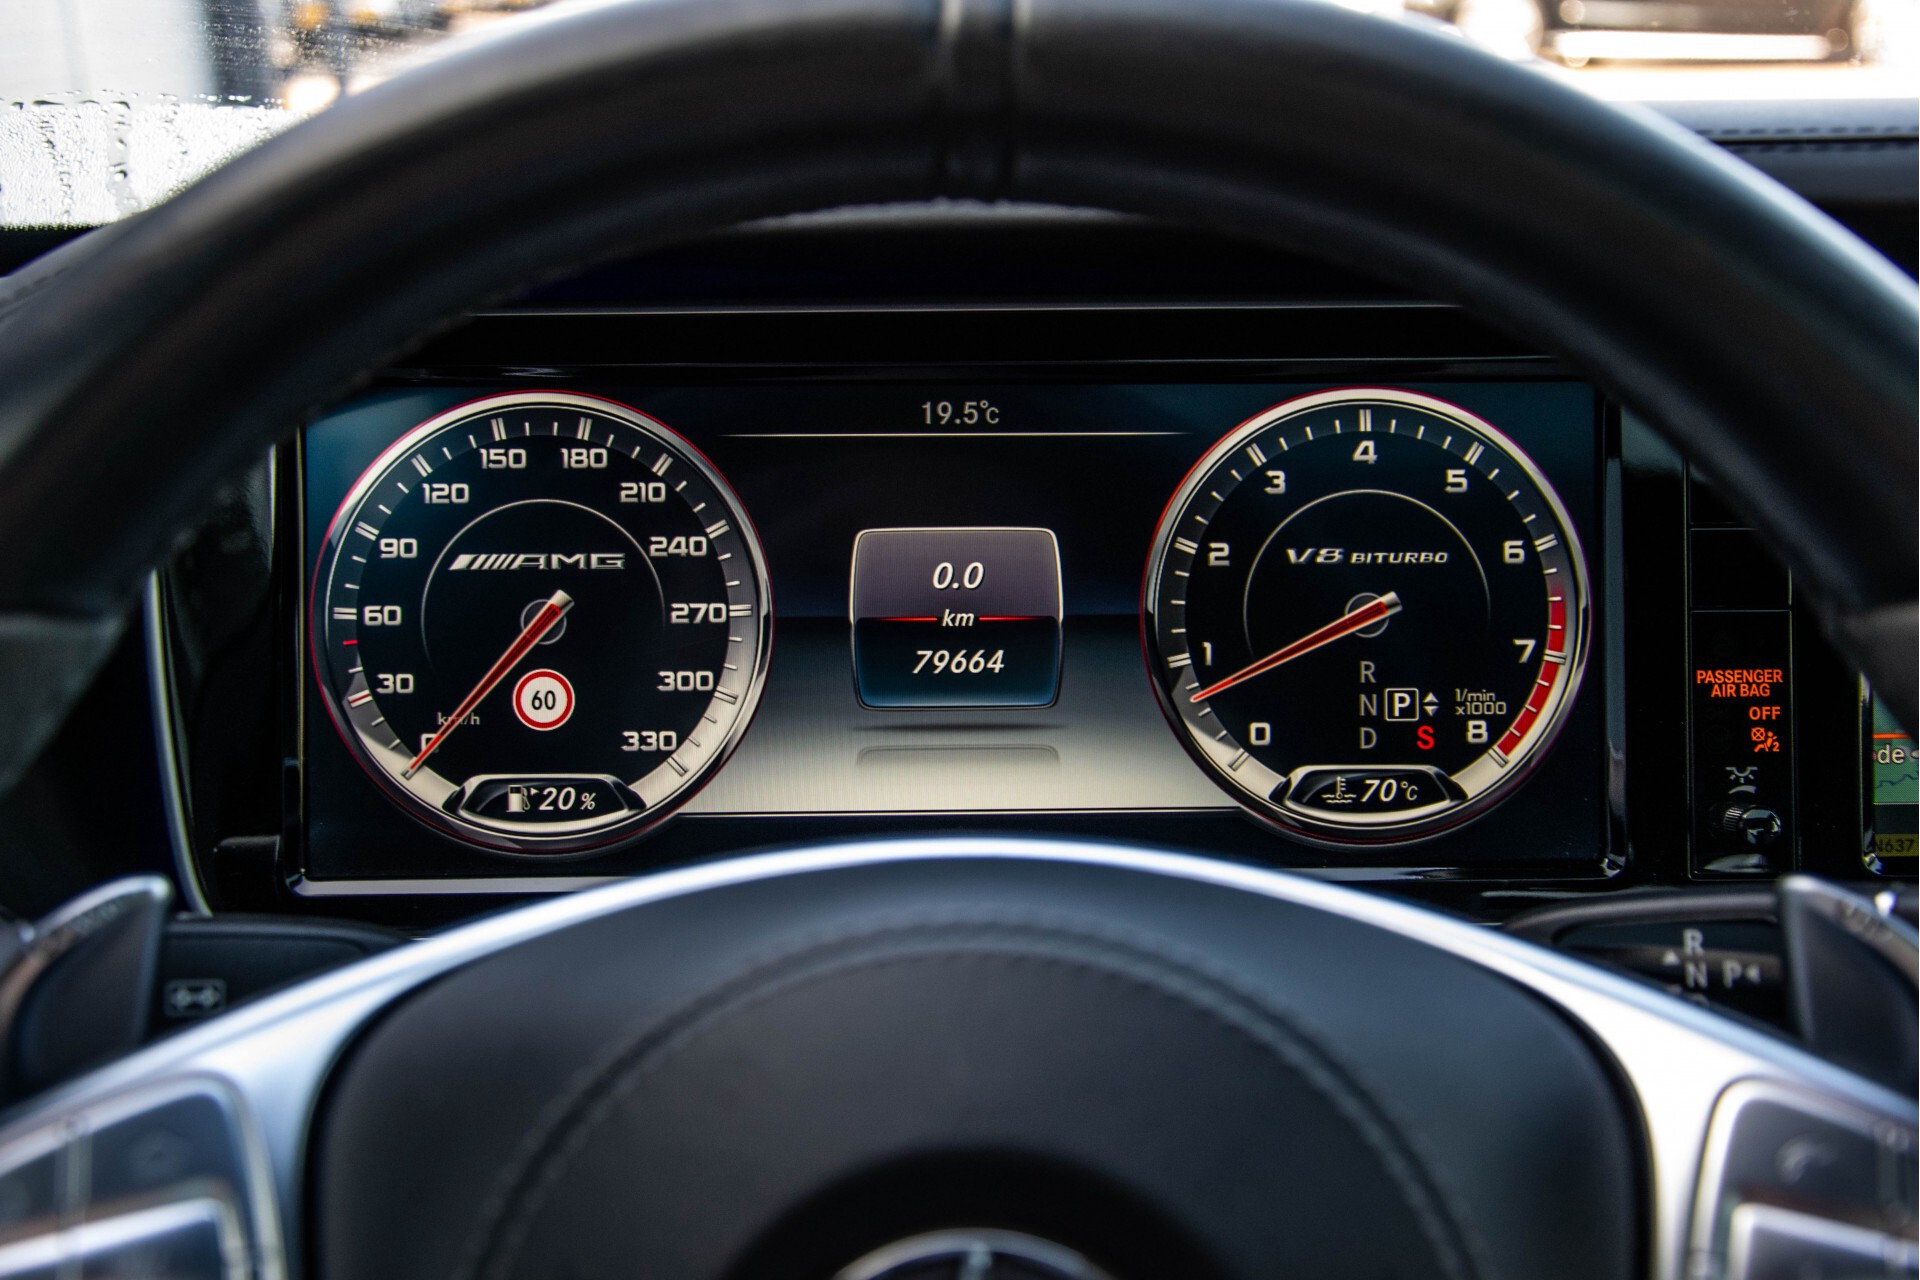 Mercedes-Benz S-Klasse 63 AMG Exclusive/Burmester High-End/Driverspack Aut7 Foto 12